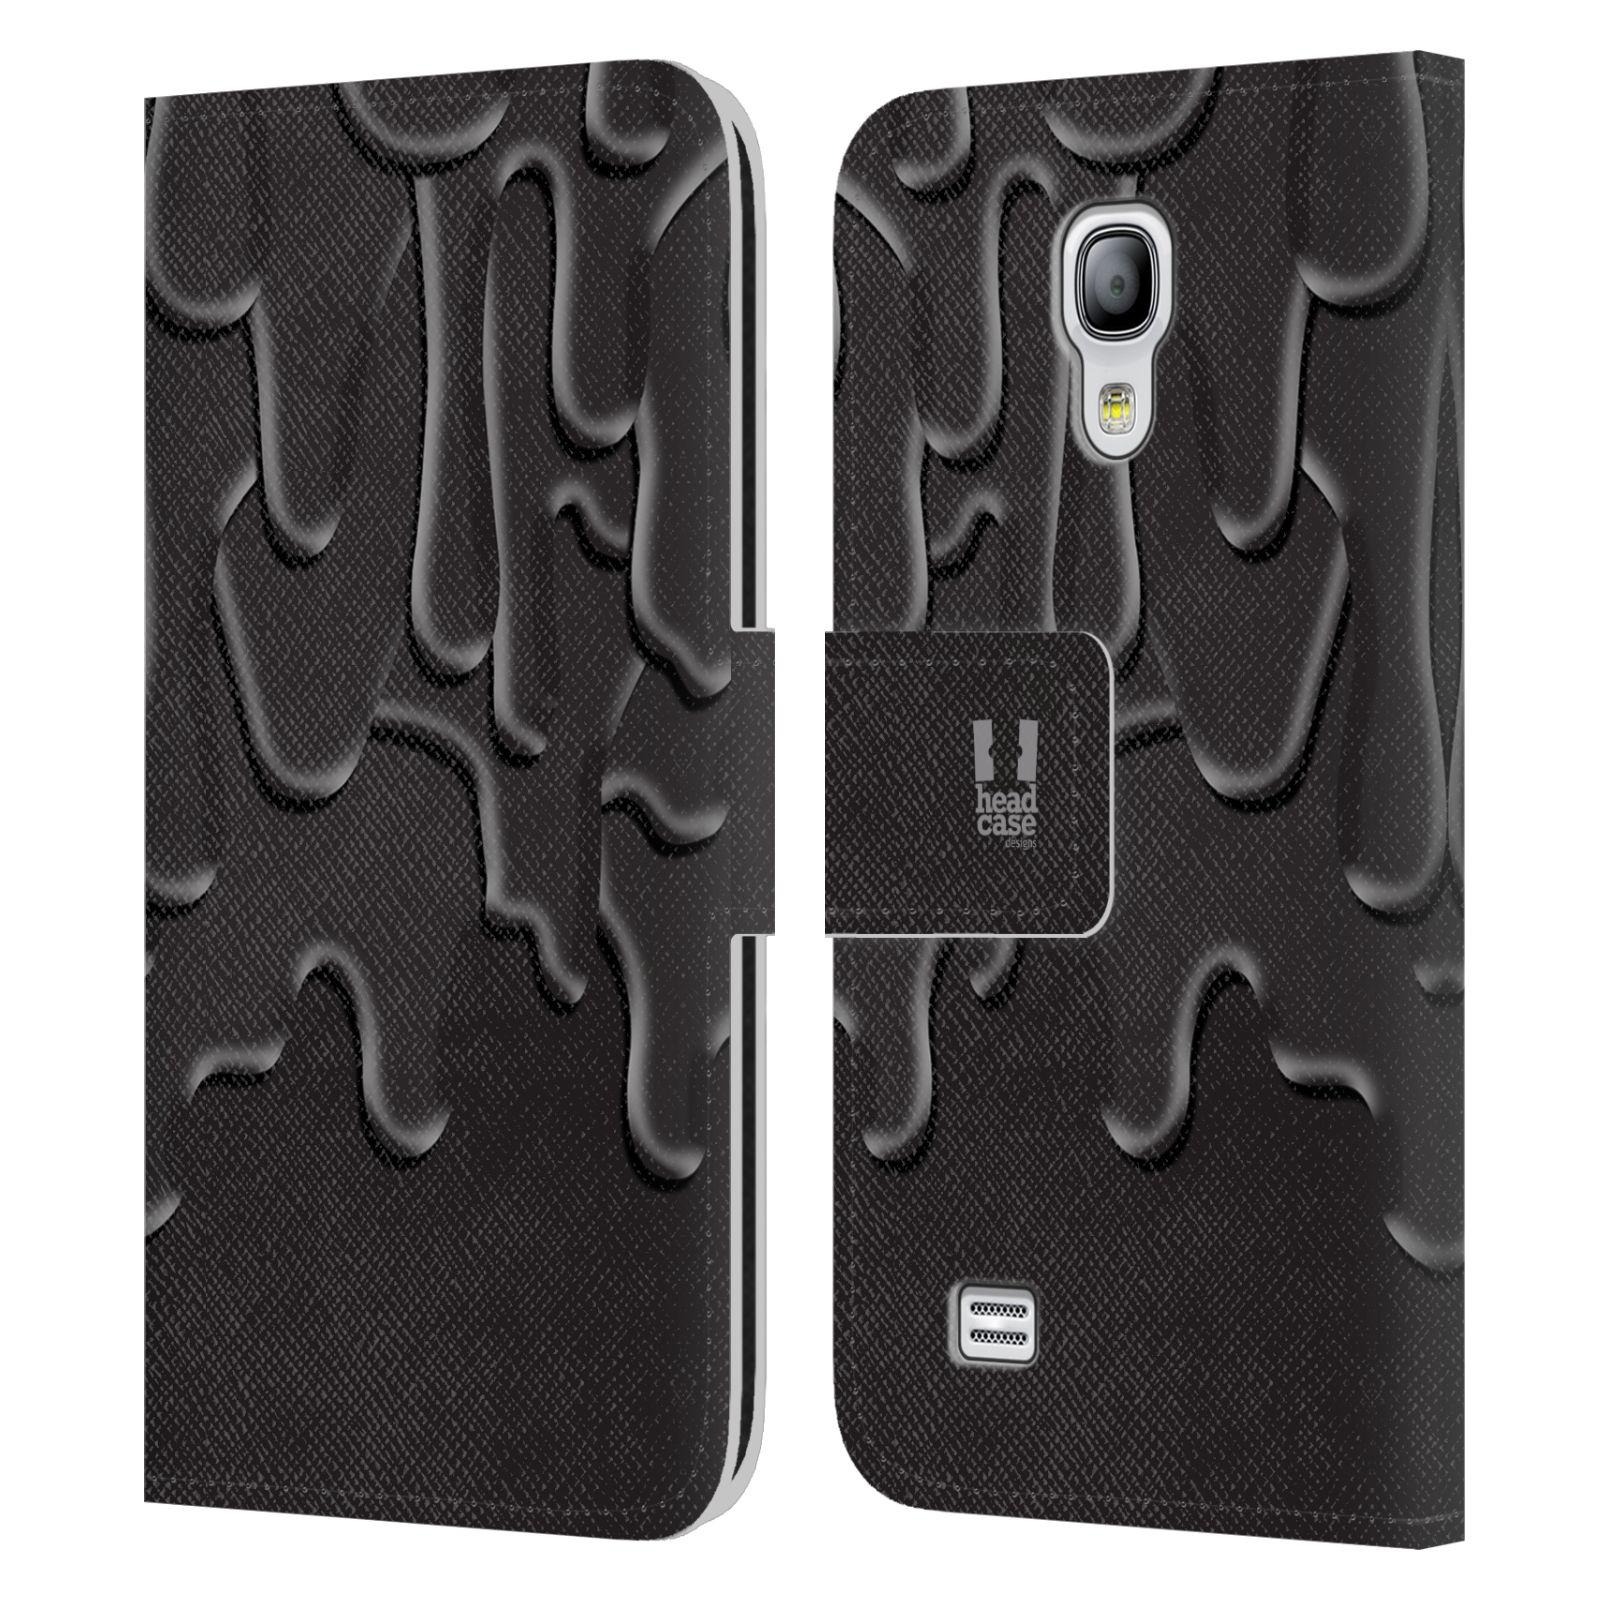 HEAD CASE Flipové pouzdro pro mobil Samsung Galaxy S4 MINI / S4 MINI DUOS ZÁPLAVA BARVA černá